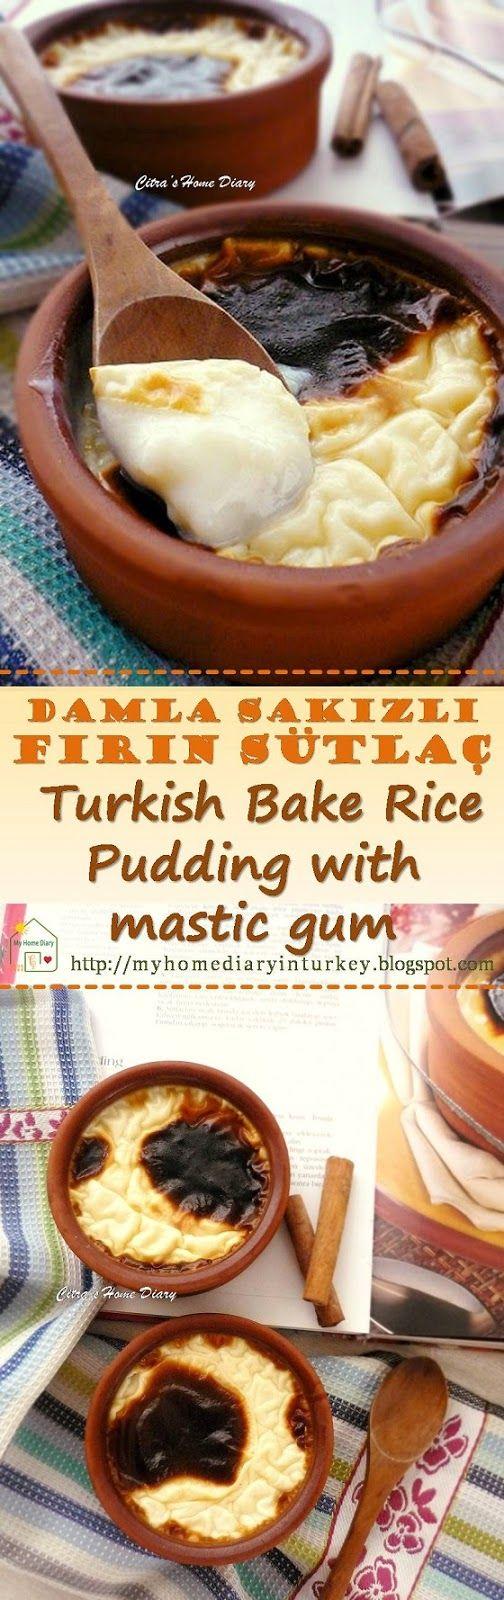 Damla Sakızlı Fırın Sütlaç (Turkish Rice Pudding with mastic gum). #turkishcuisine #ricepudding #dessert #tatlı